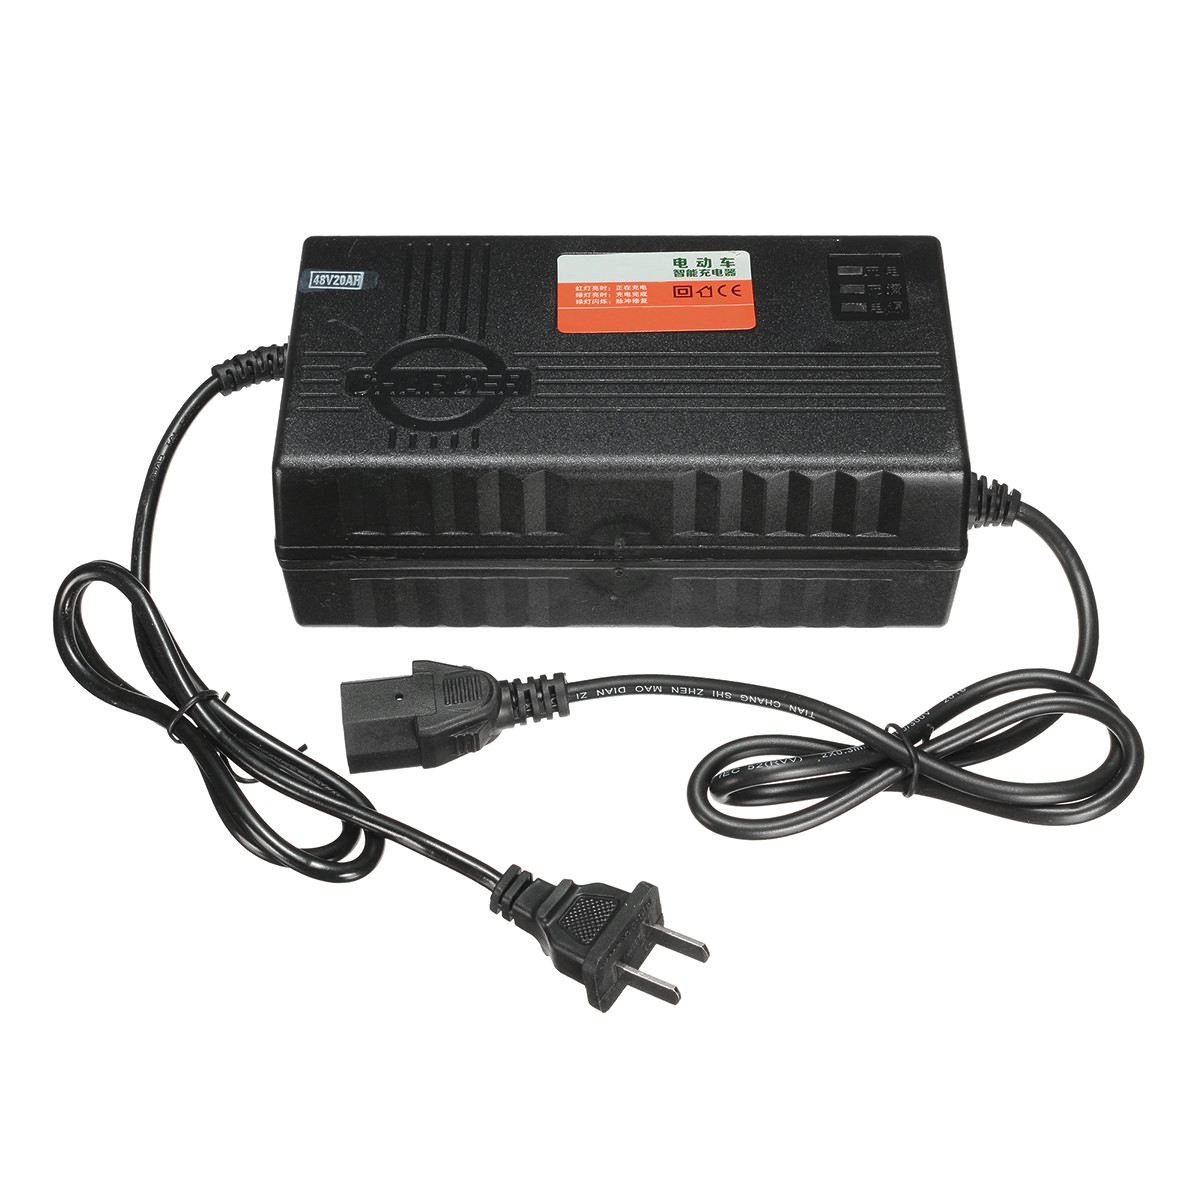 48v 2 5a battery electric car charger electric scooter plug alex nld. Black Bedroom Furniture Sets. Home Design Ideas